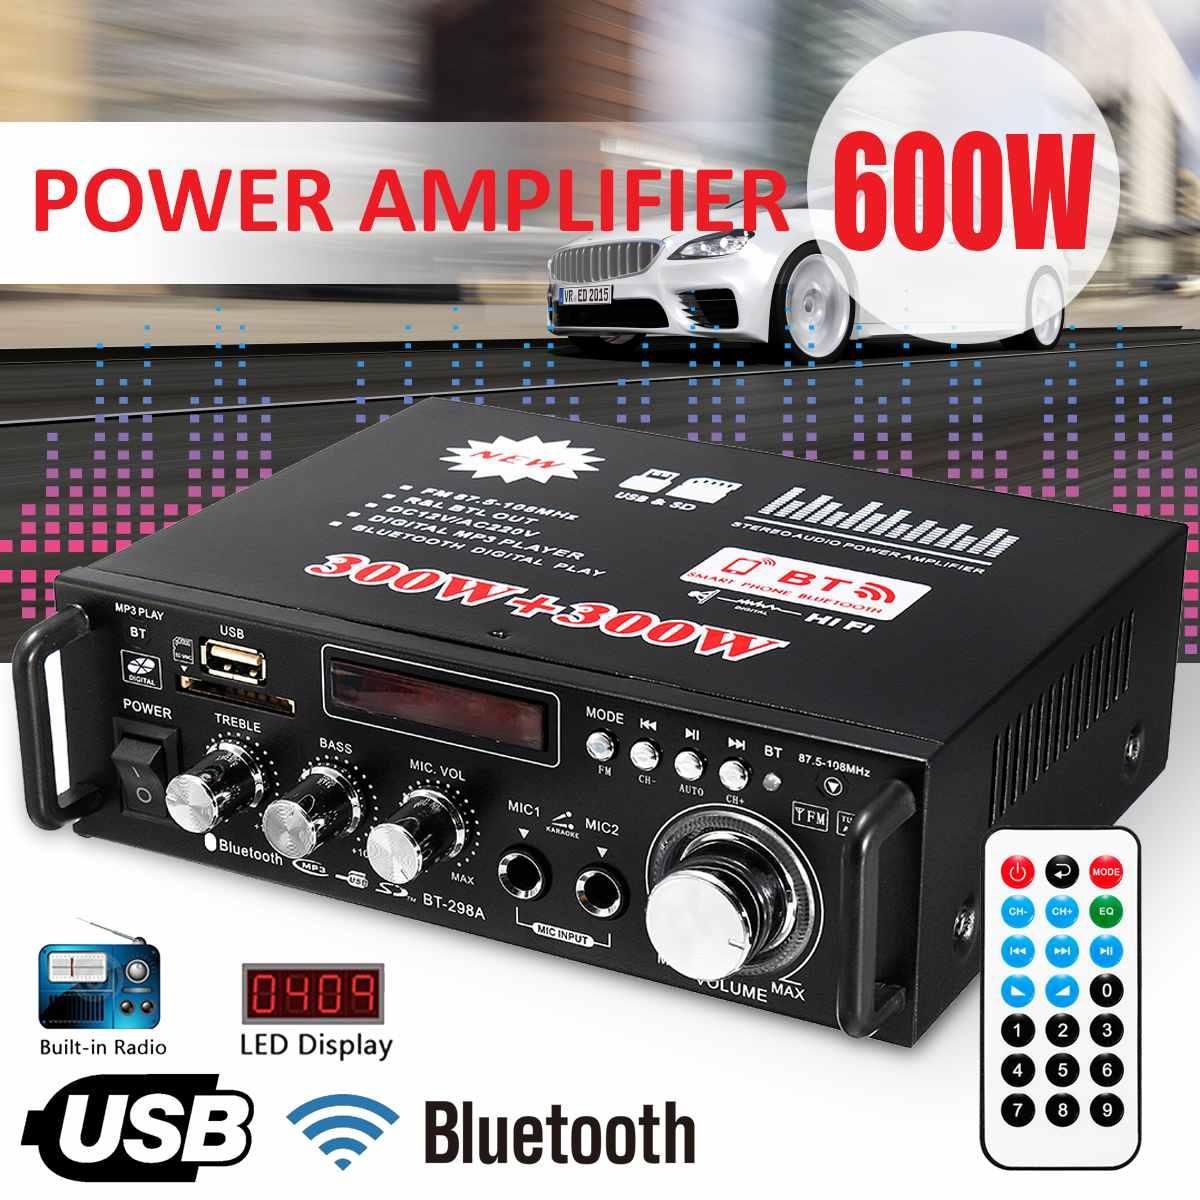 Audio Power-Amplifier Lcd-Display Remote-Control Fm-Radio Stereo Digital Bluetooth BT-298A